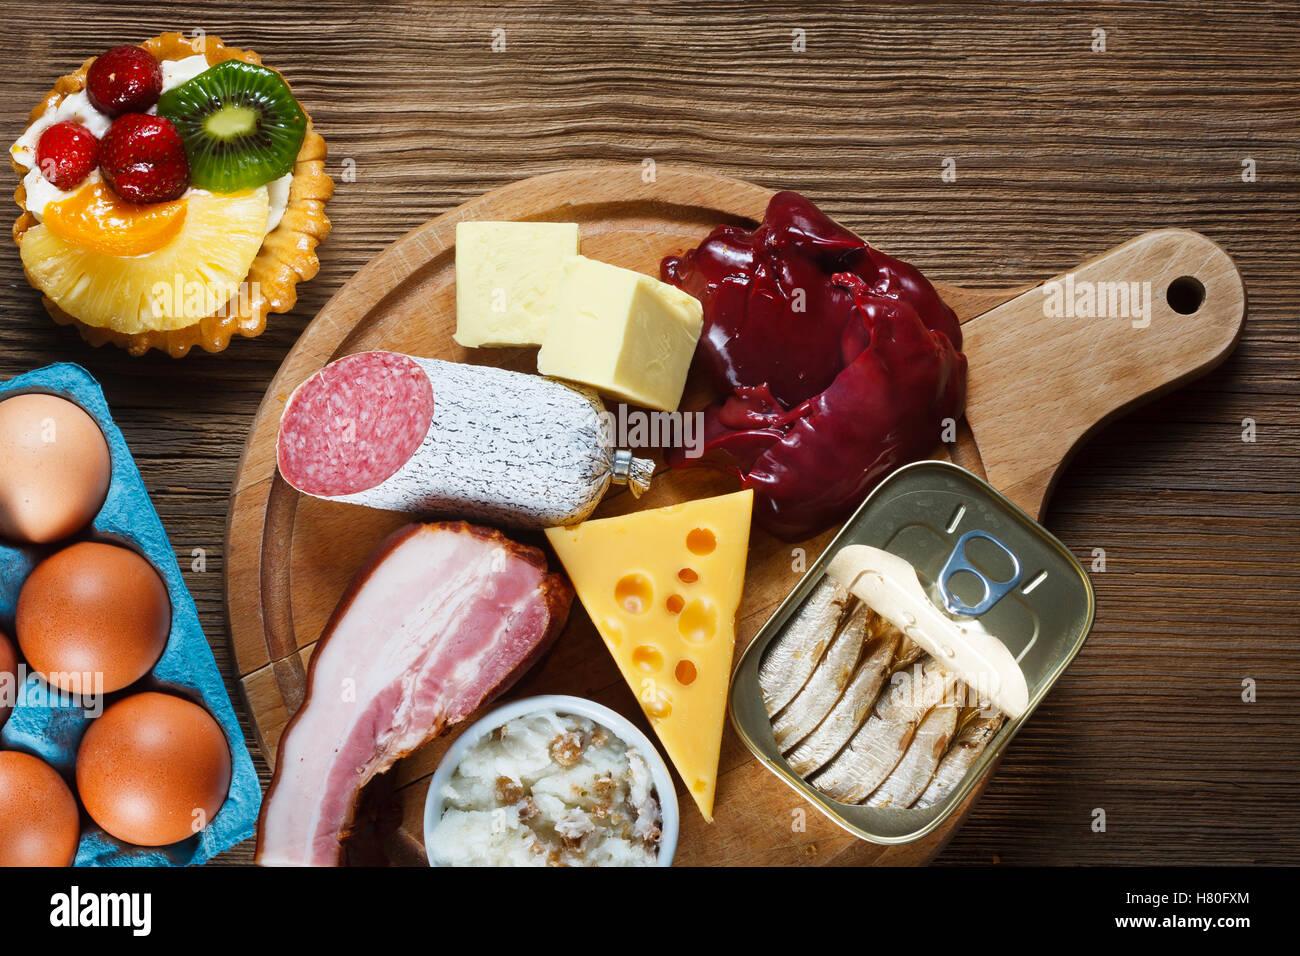 Lebensmittel reich an Cholesterin wie Eiern, Leber, gelben Käse, Butter, Speck, Schmalz mit Zwiebeln, Sardinen Stockbild